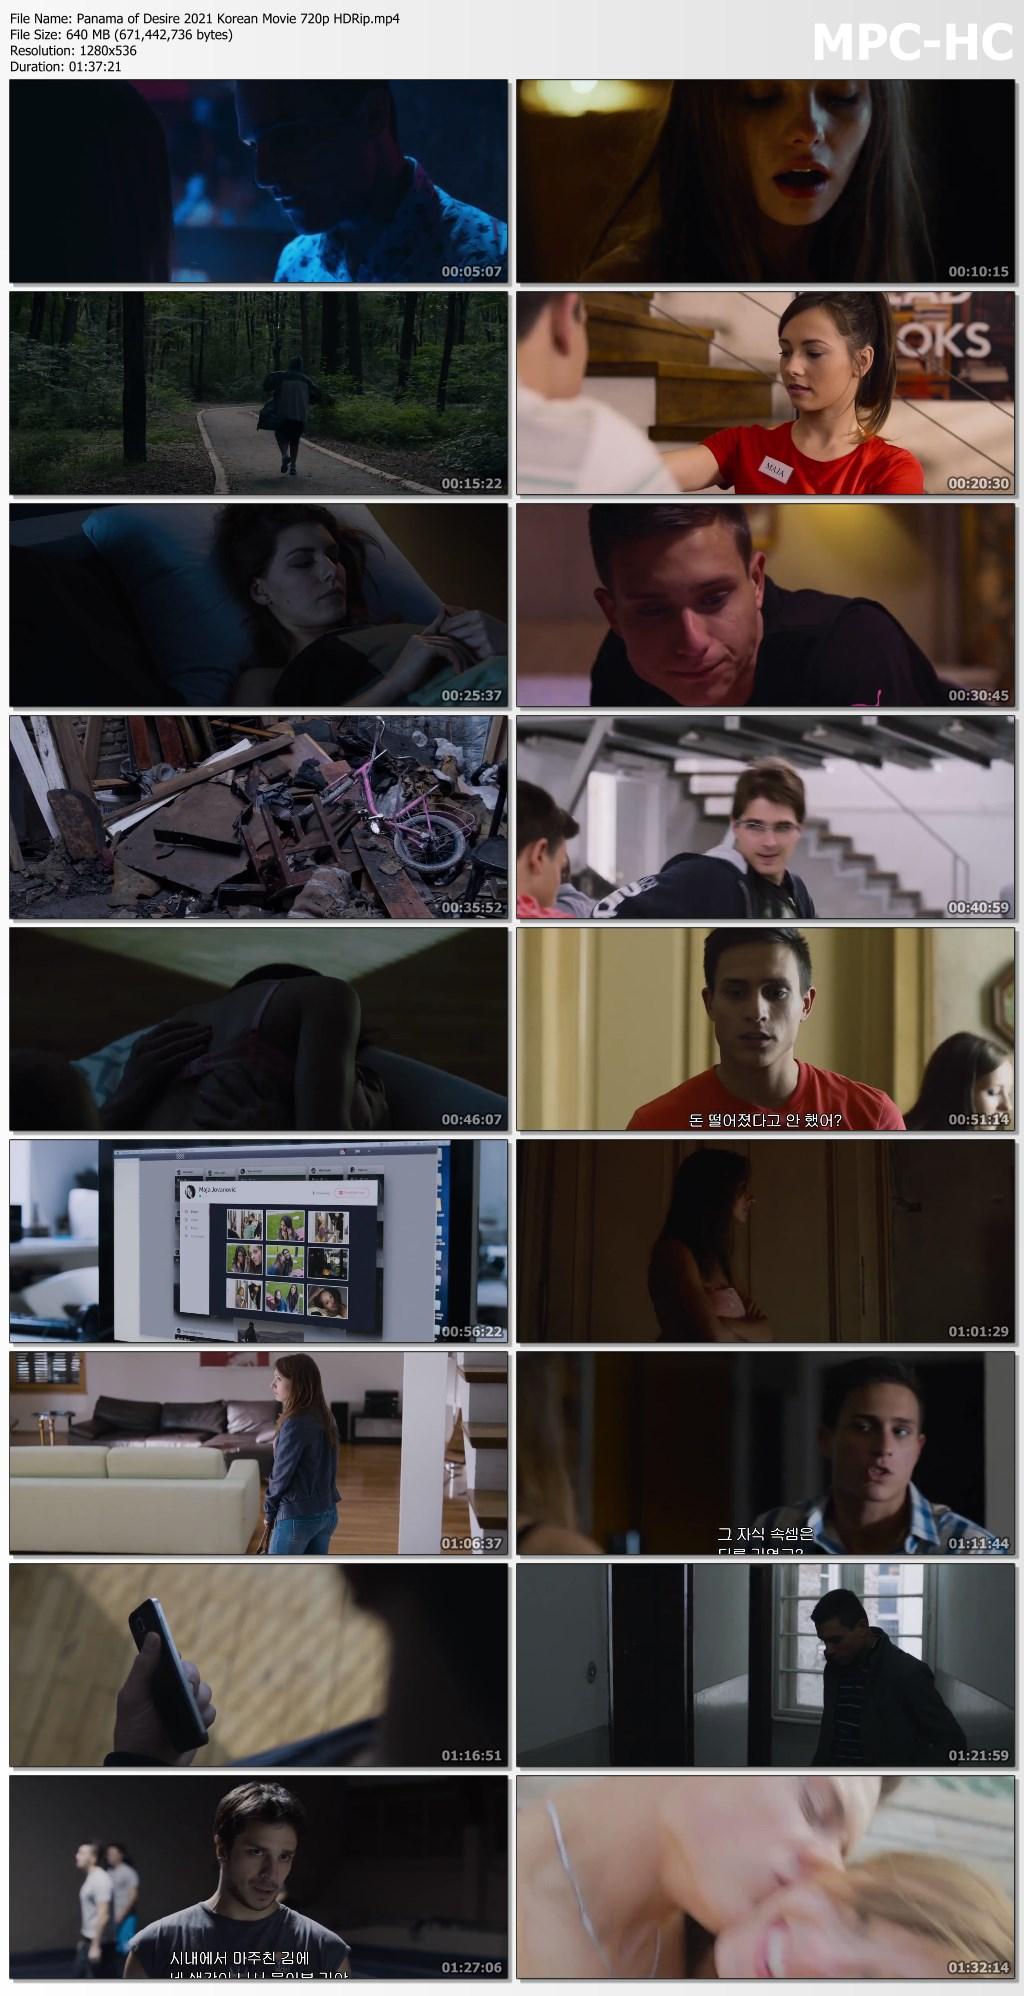 Panama of Desire 2021 Korean Movie 720p HDRip.mp4 thumbs